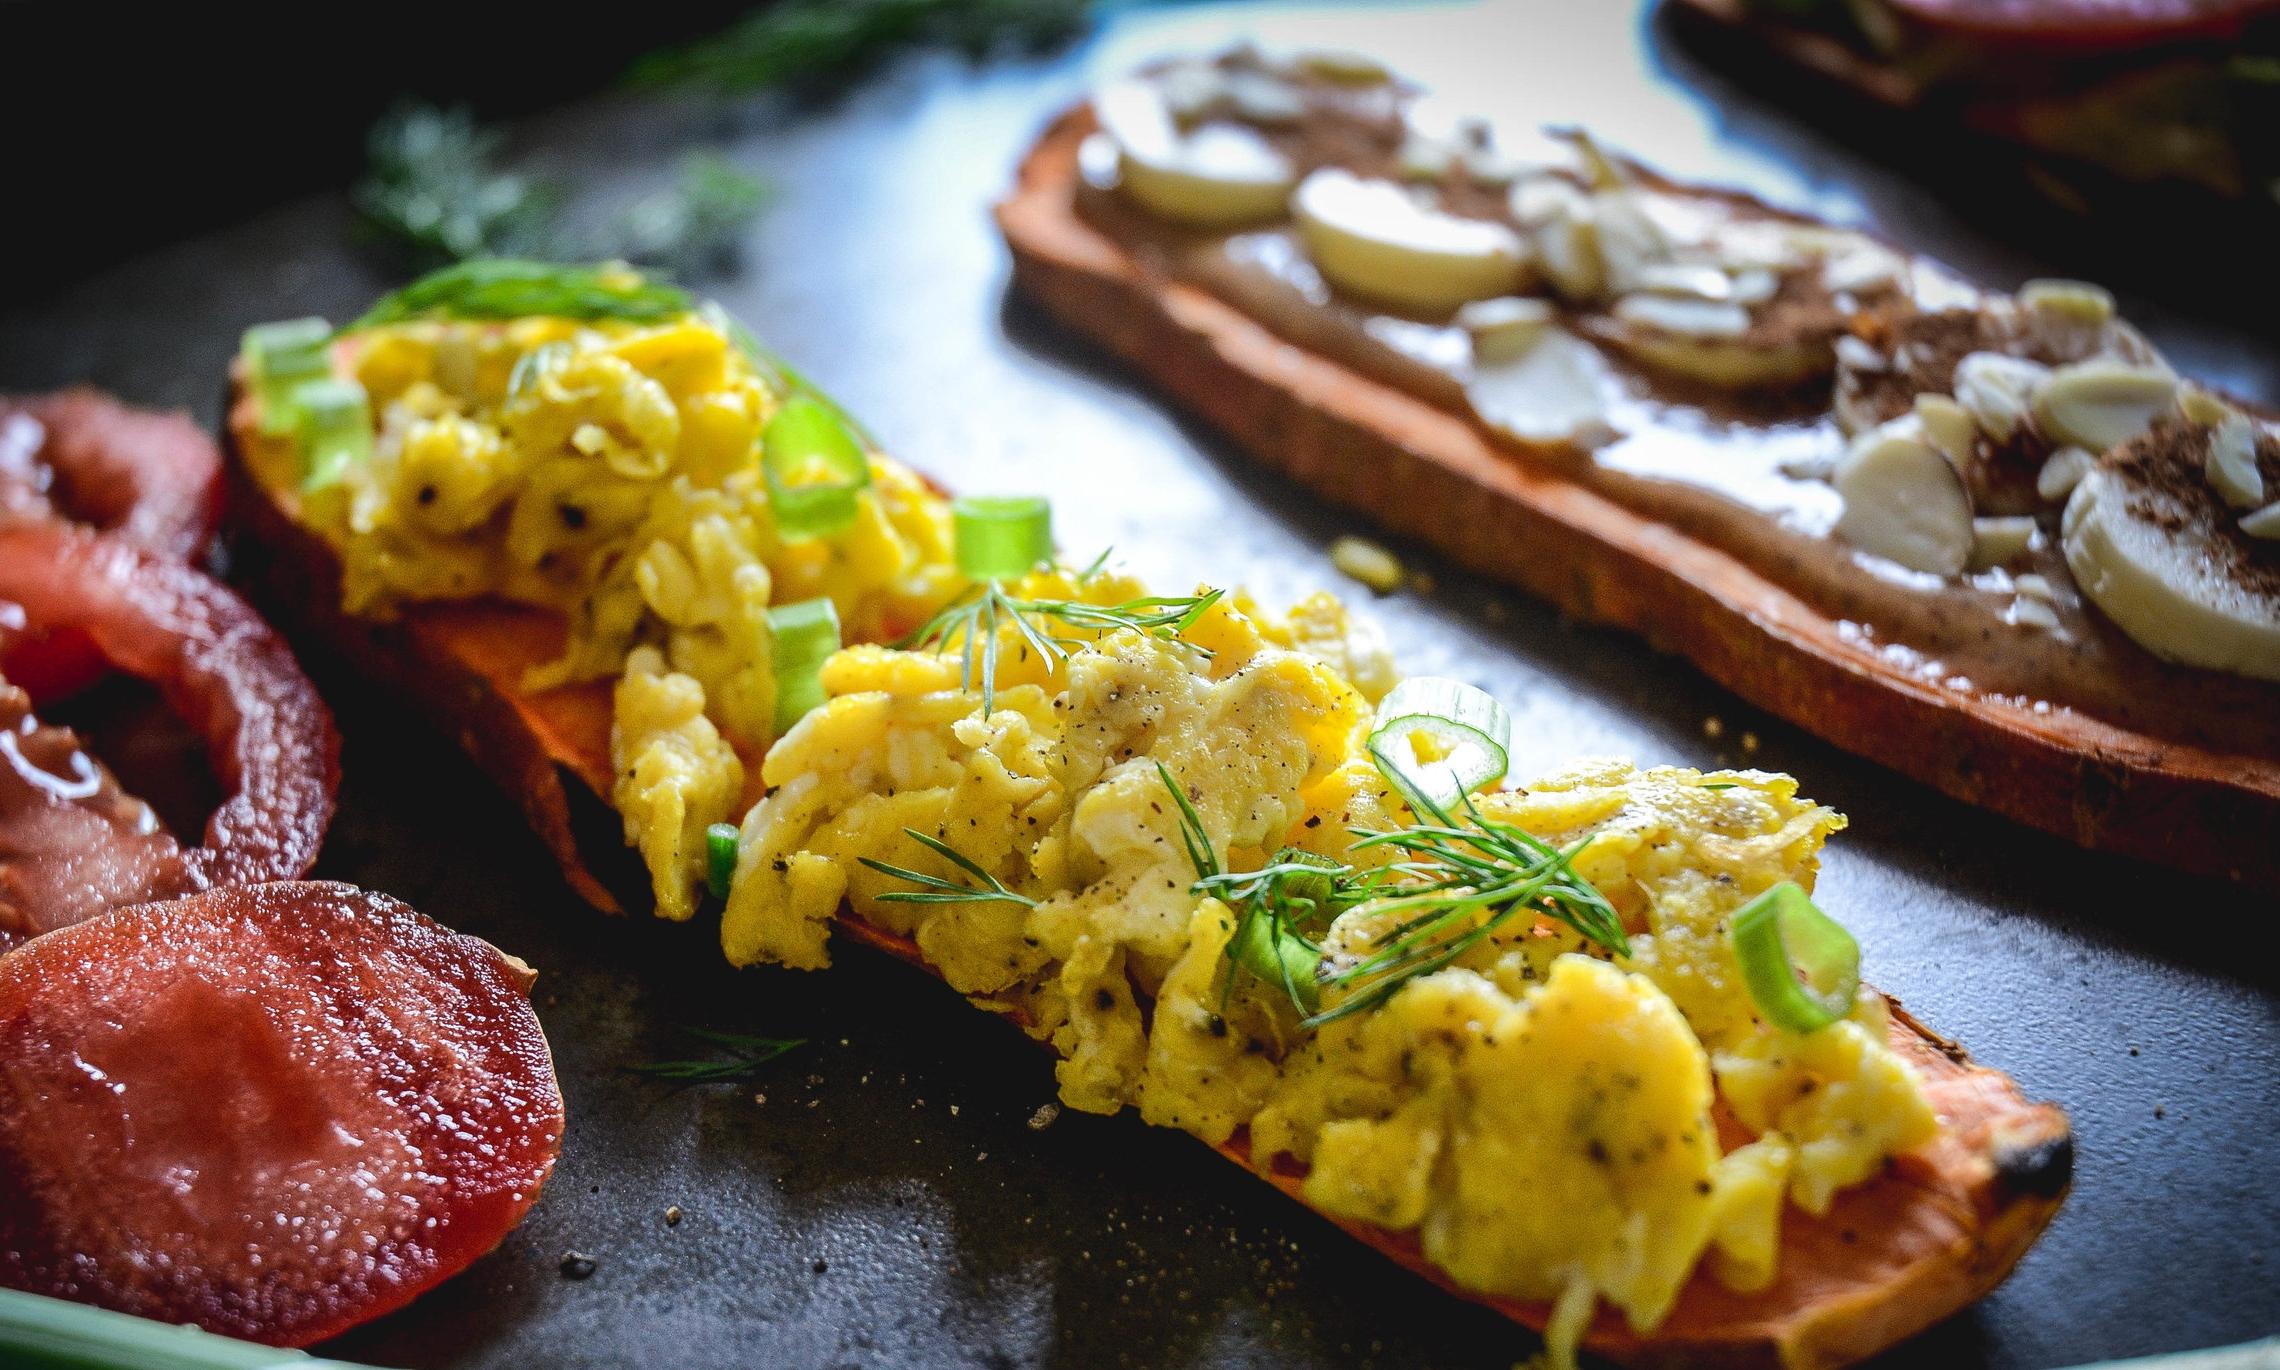 sweet potato toast with egg and scallions